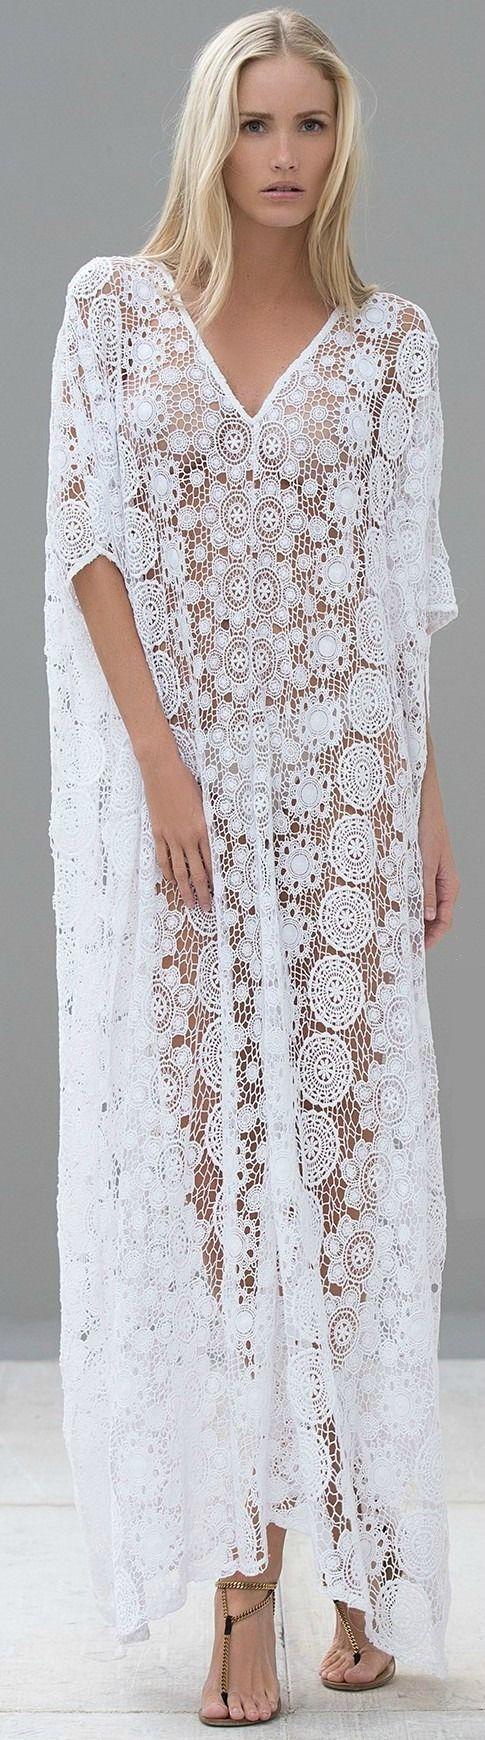 Alexis spring the valerie dress vintage bohemian us